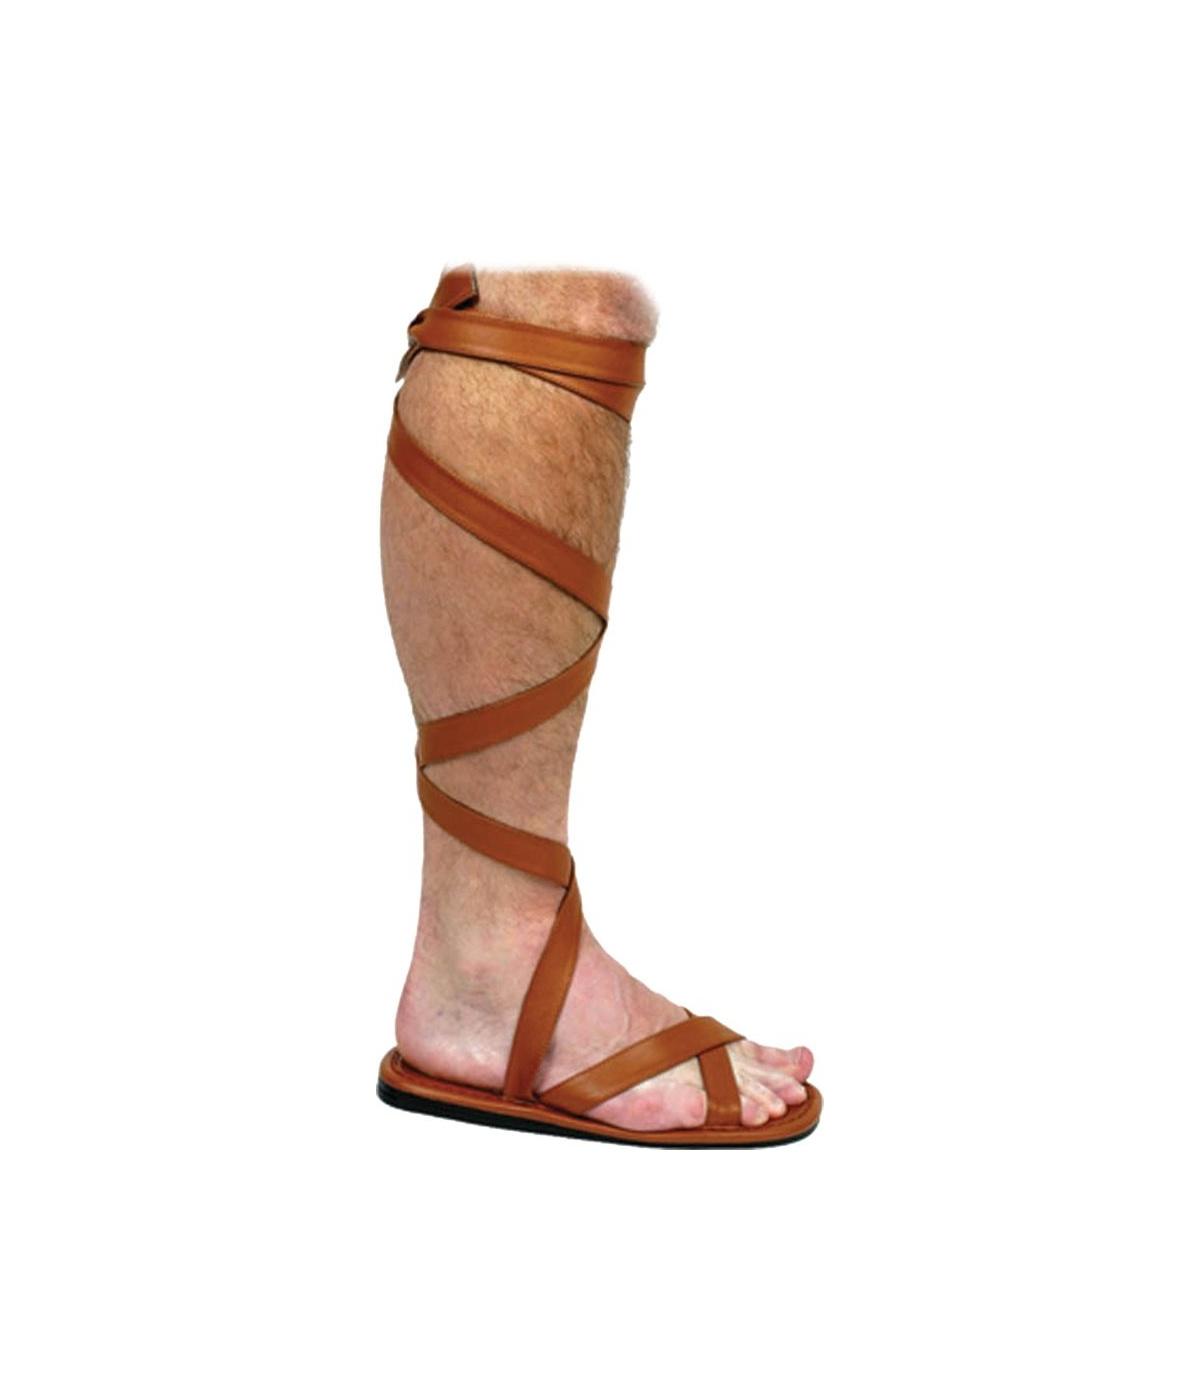 46d4ff1bf5f Roman Sandal Shoes Adult - Men Roman Costumes